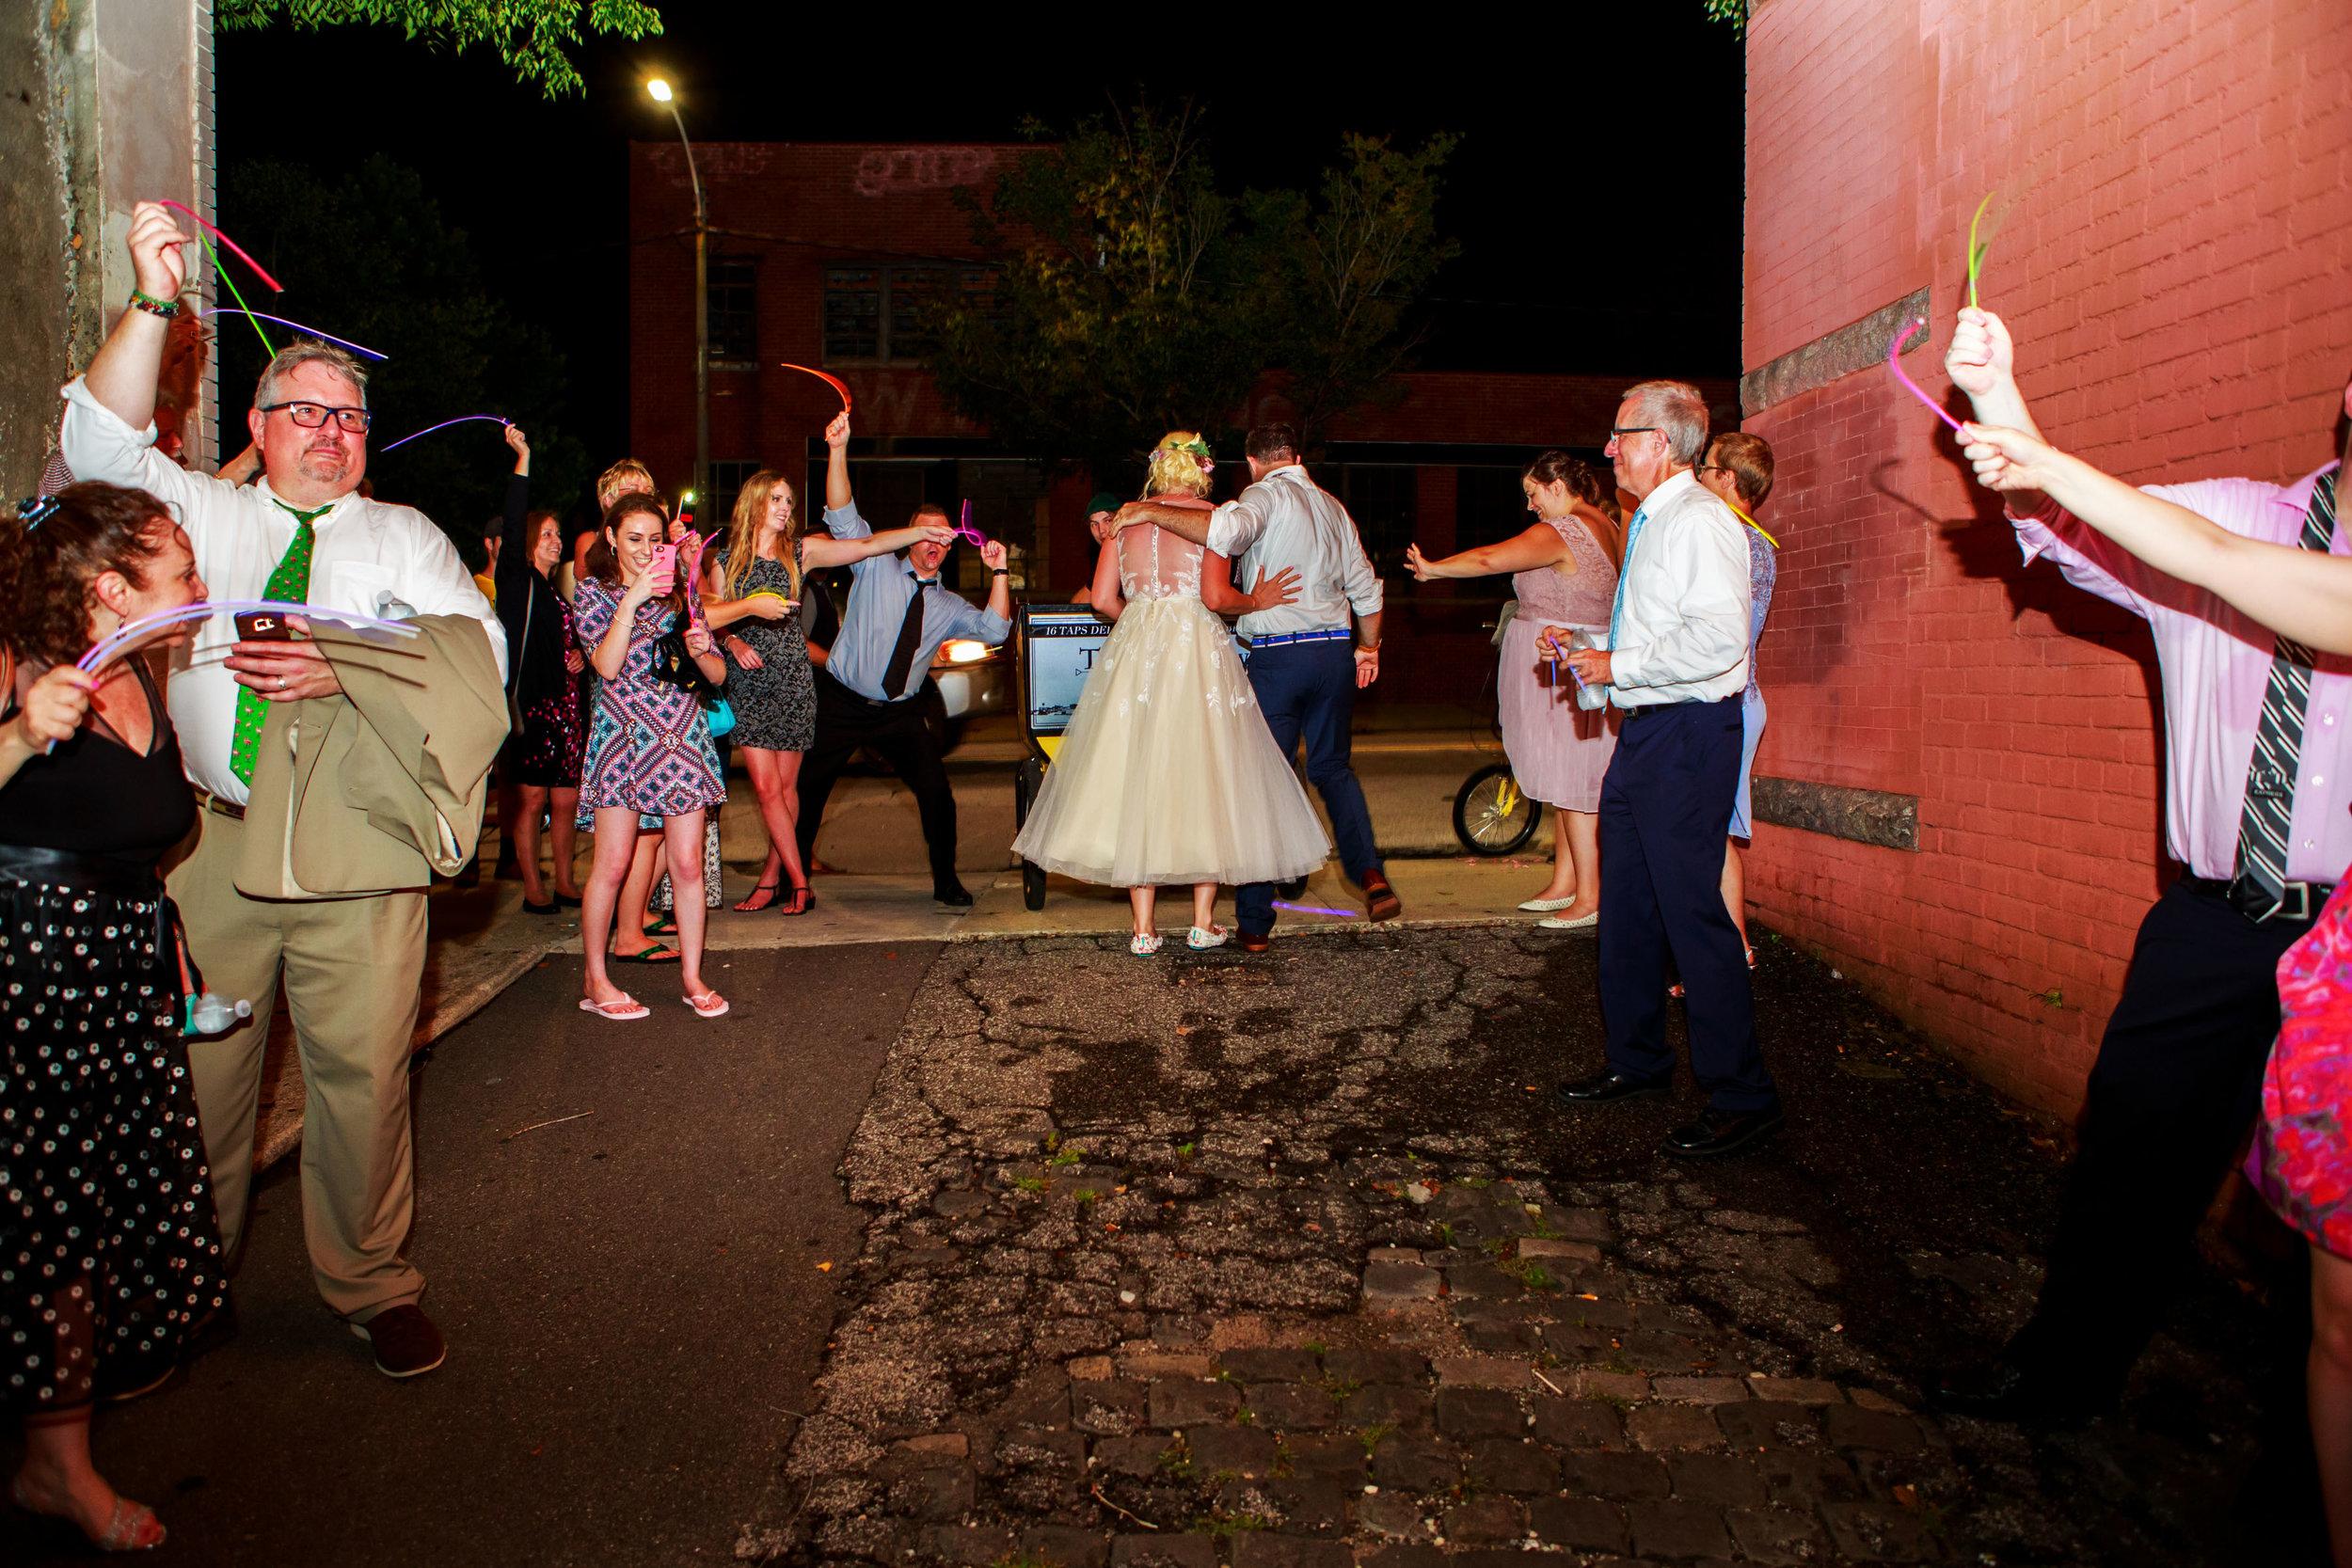 128-South-Wedding-Wilmington-NC-Photographer-Reception-277.jpg